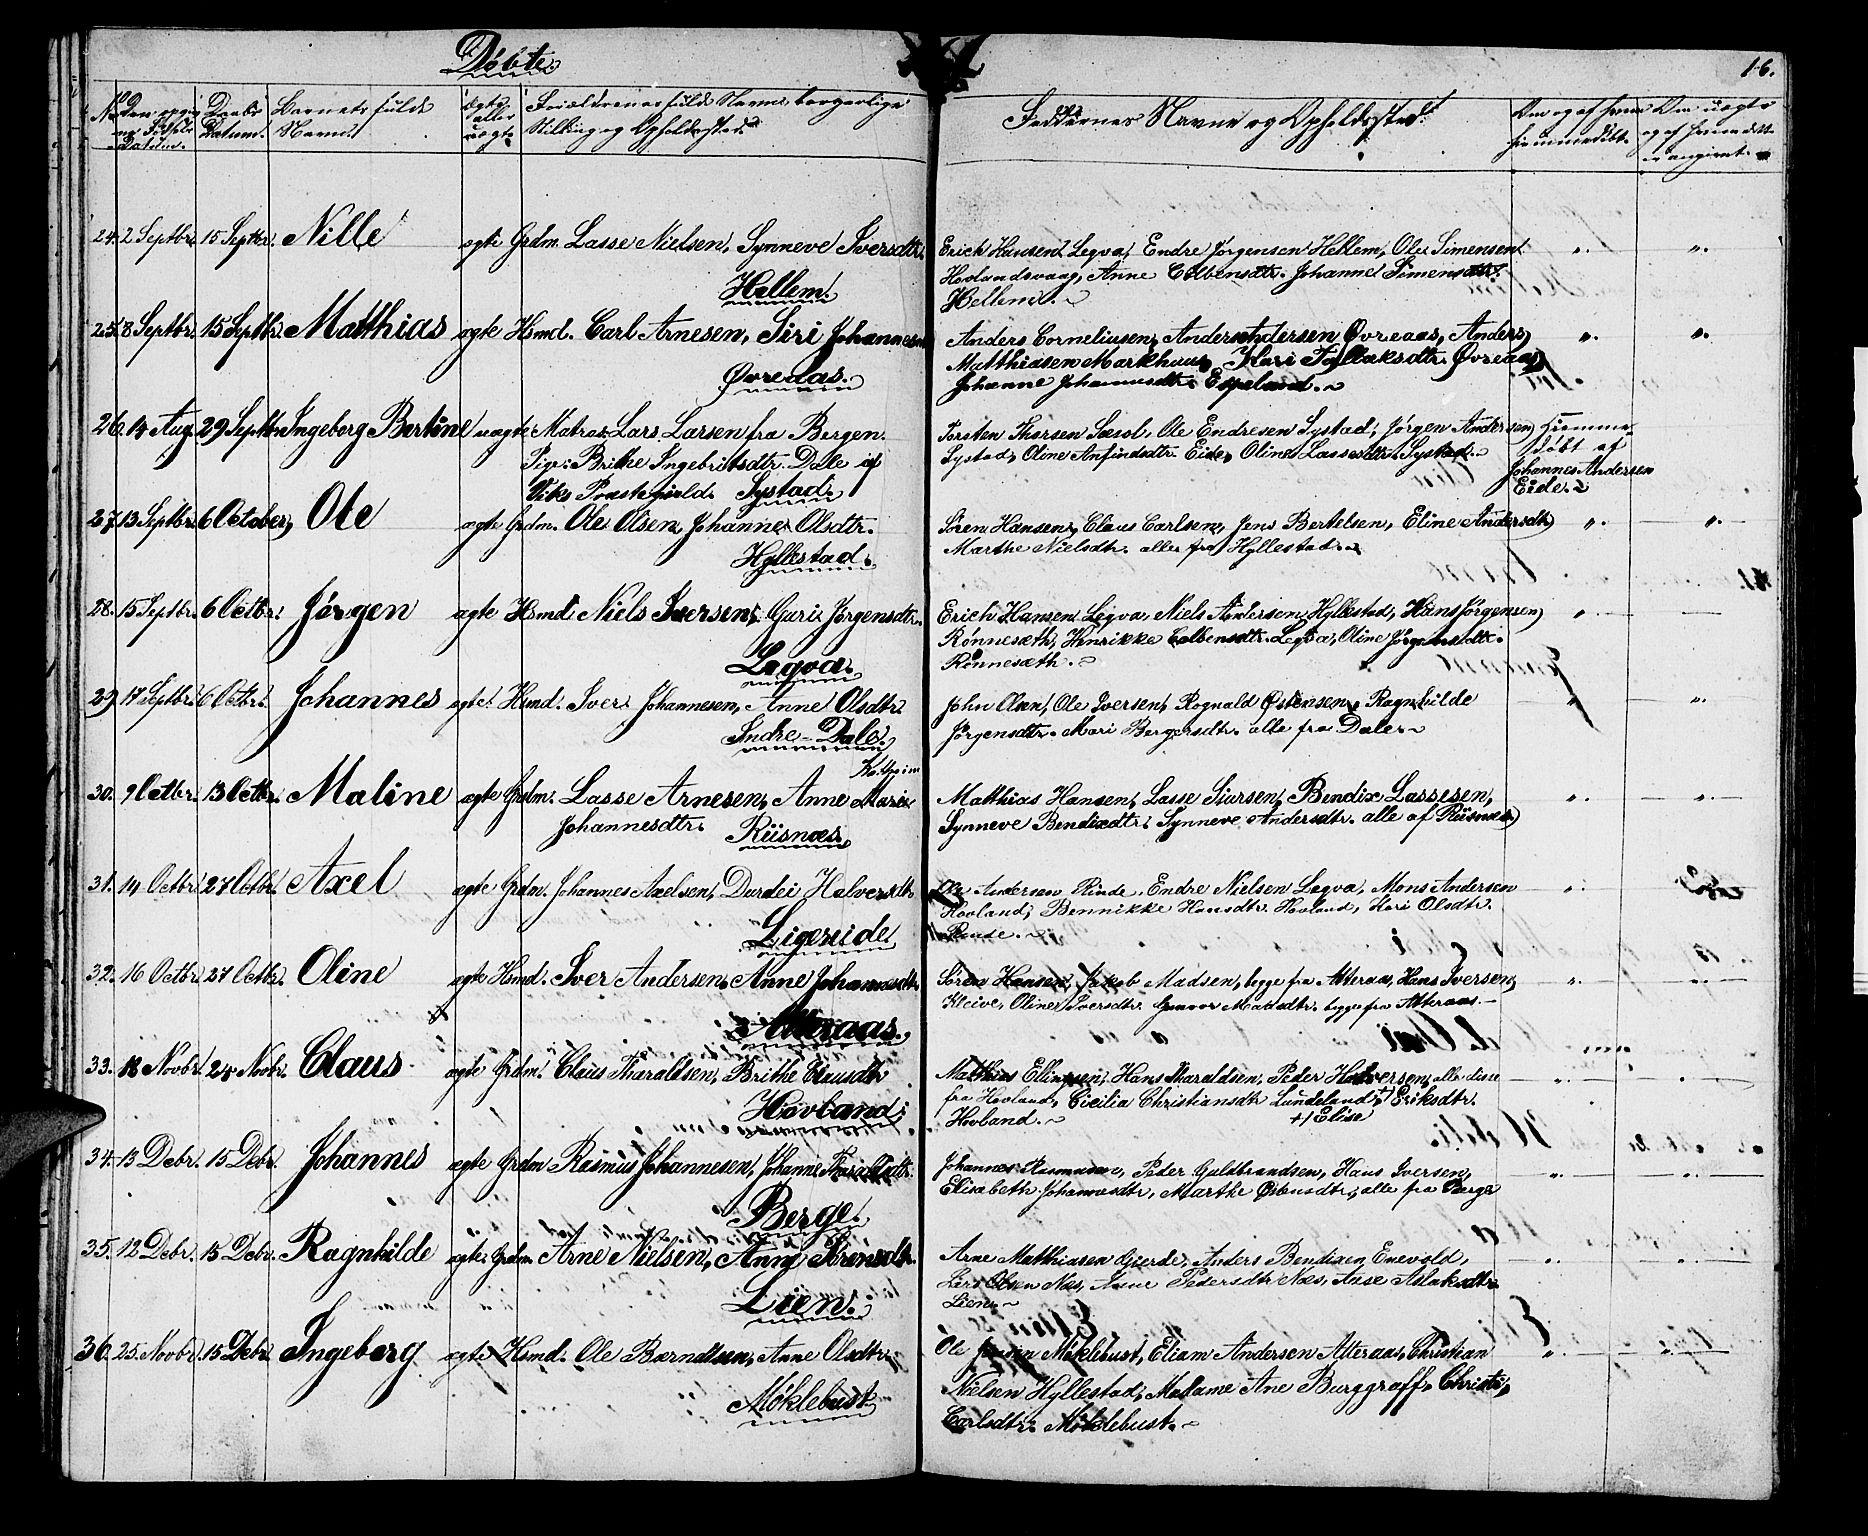 SAB, Hyllestad Sokneprestembete, Klokkerbok nr. A 1, 1853-1875, s. 16